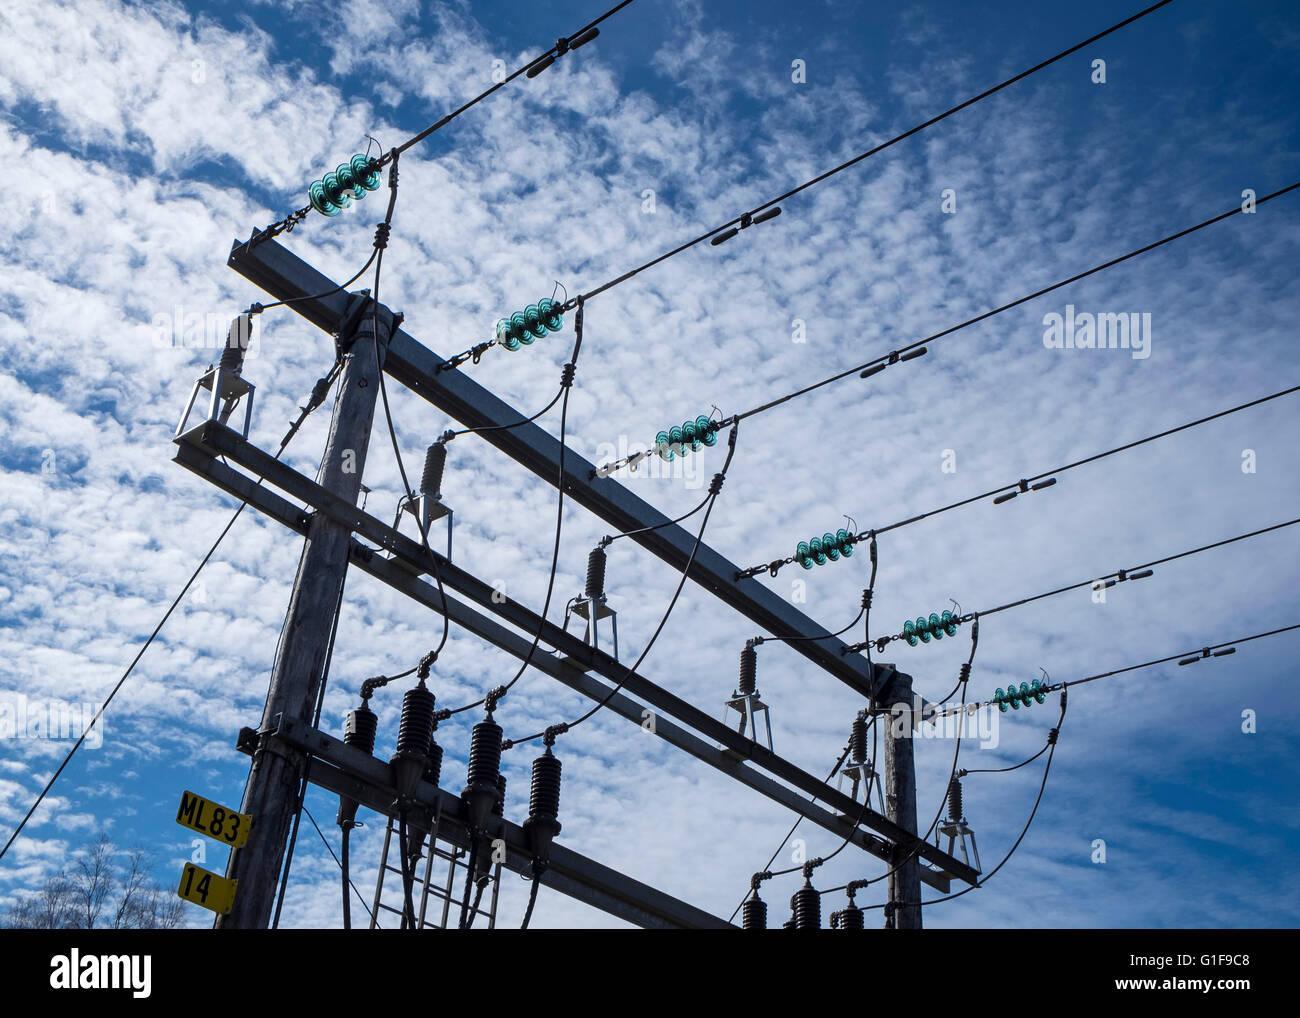 Power distribution - Stock Image